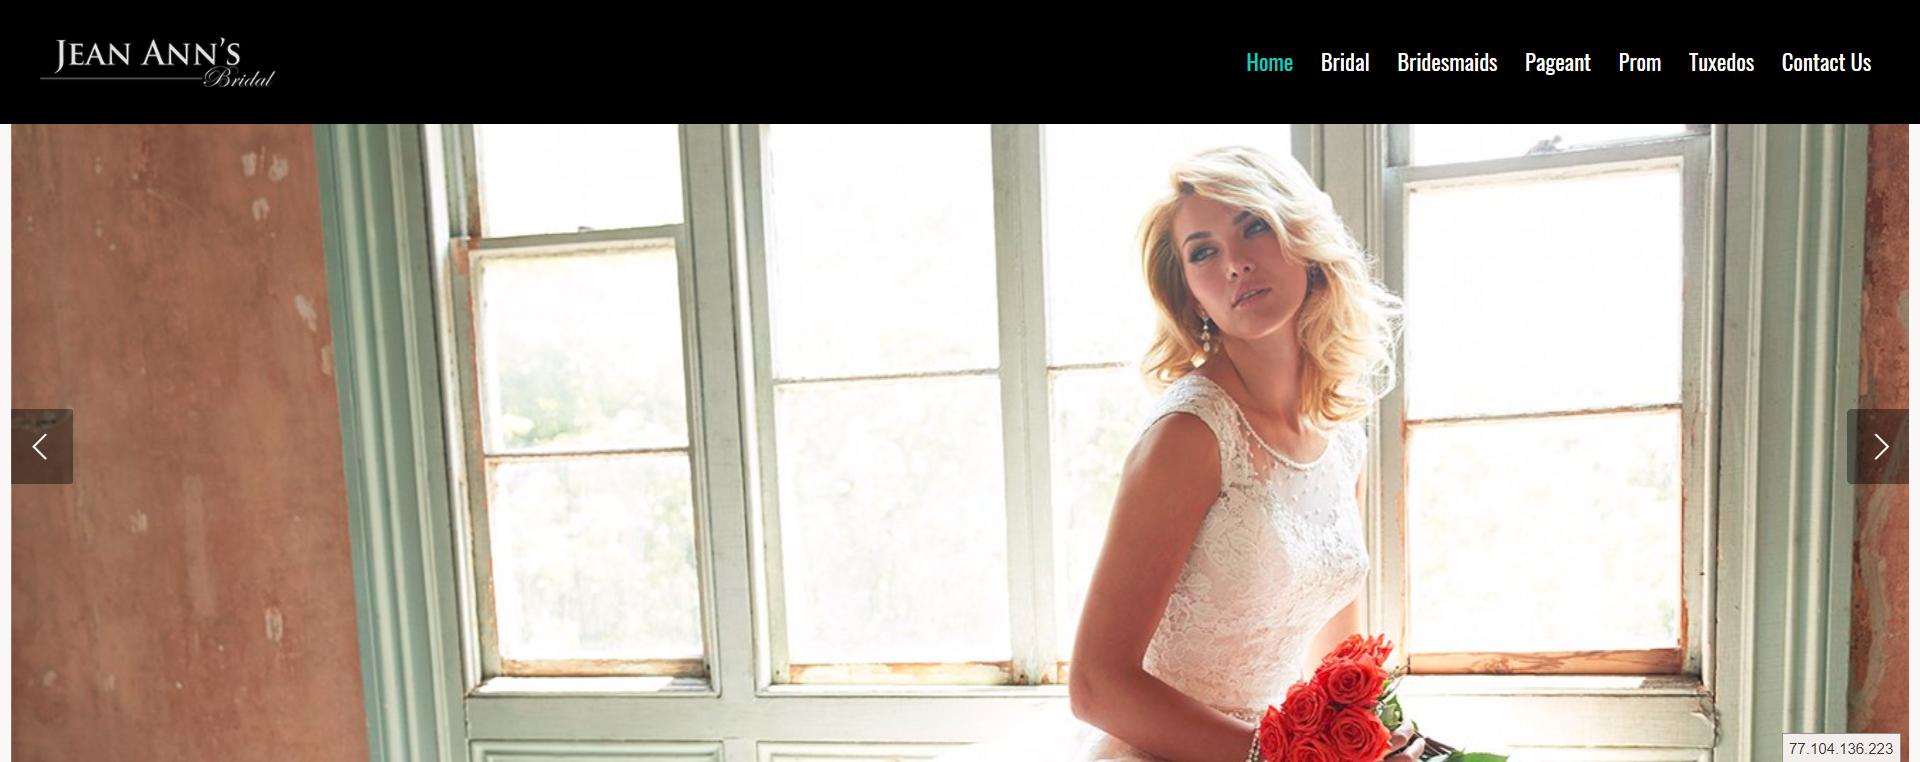 Jean Anns Bridal | Prom, Bridal, Bridesmaid, Pageants, Tuxidos